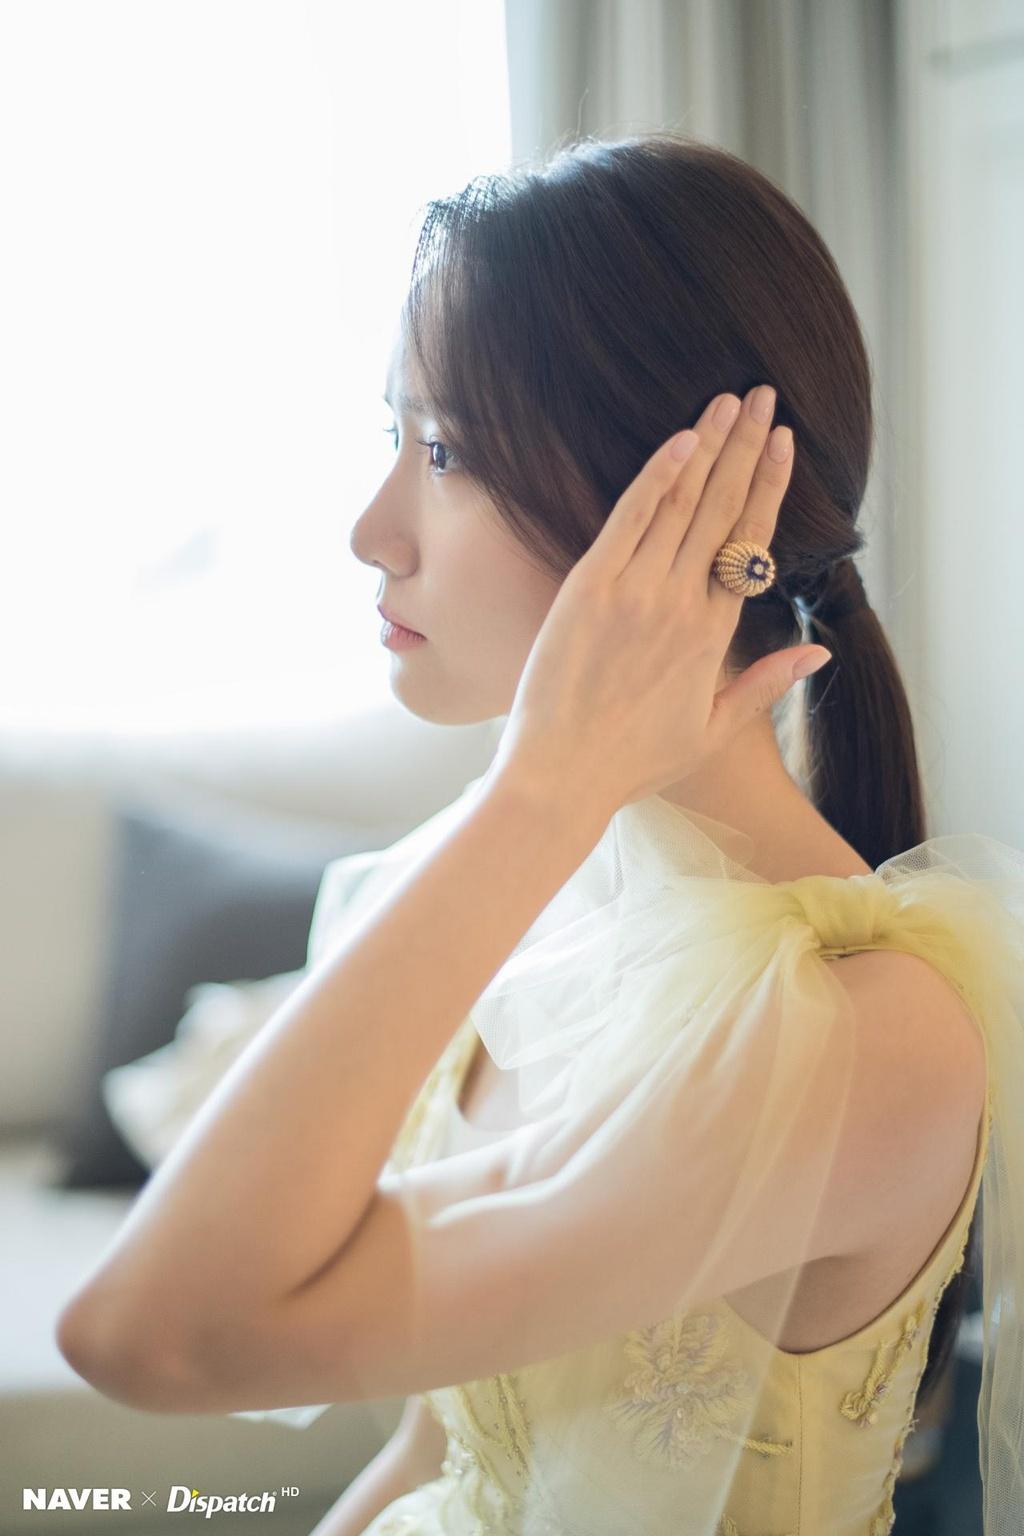 Hau truong trang diem, lam toc cua Yoona truoc khi len tham do hinh anh 6